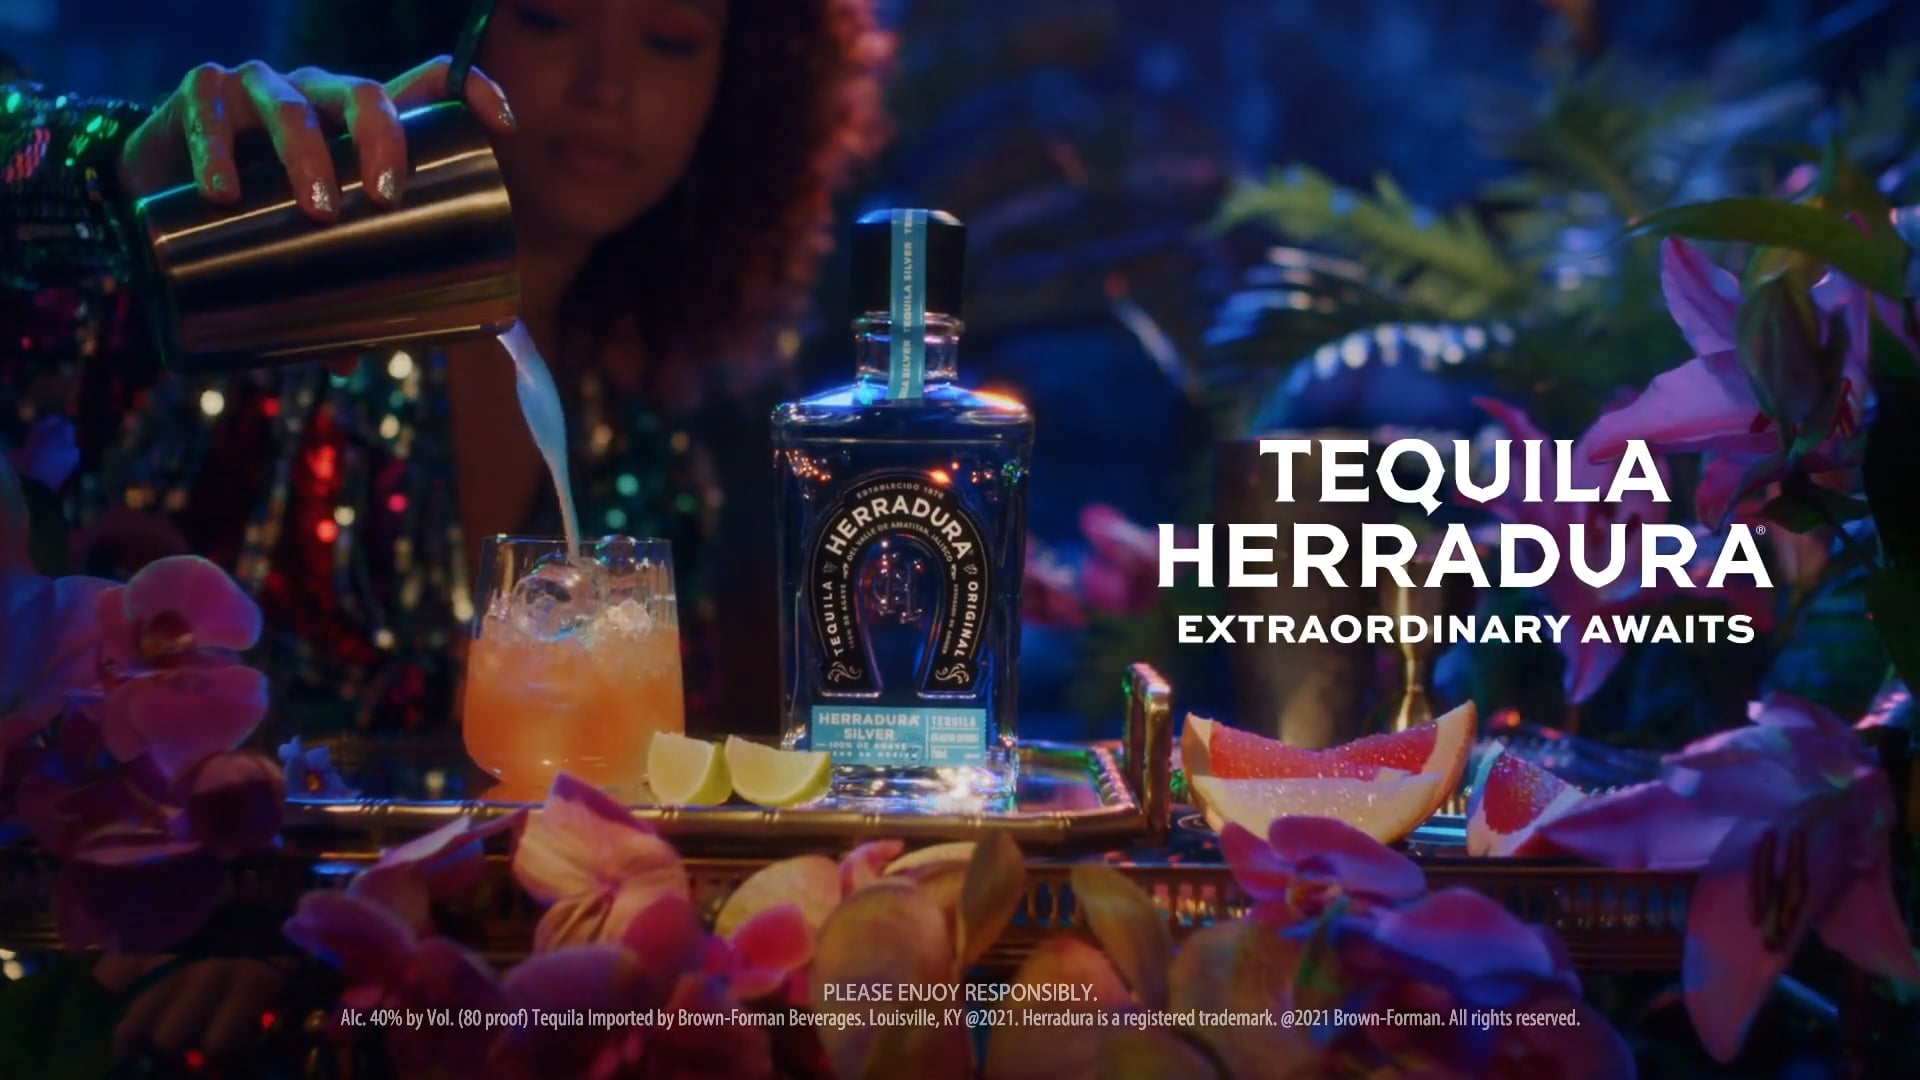 Tequila Herradura - Extraordinary Awaits